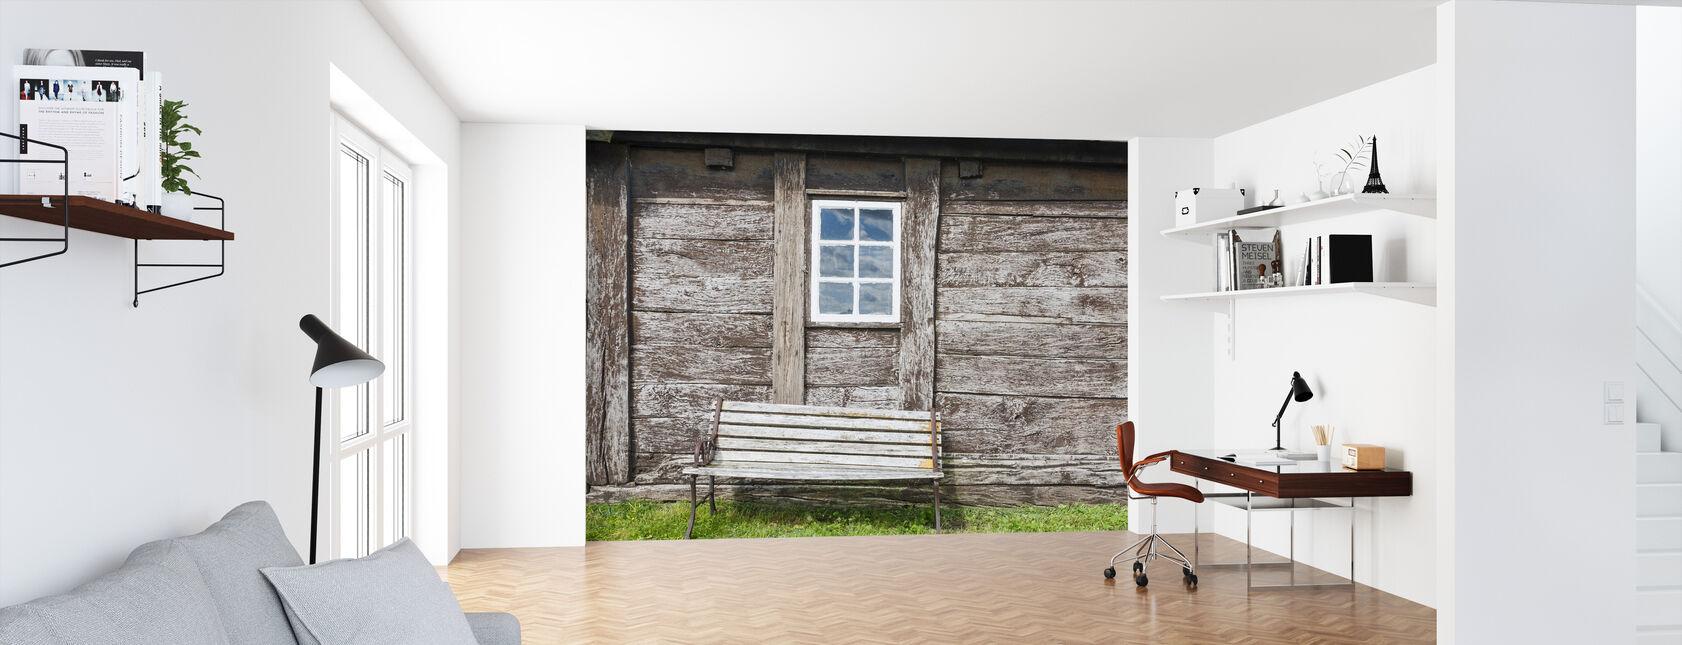 House Idyll - Wallpaper - Office